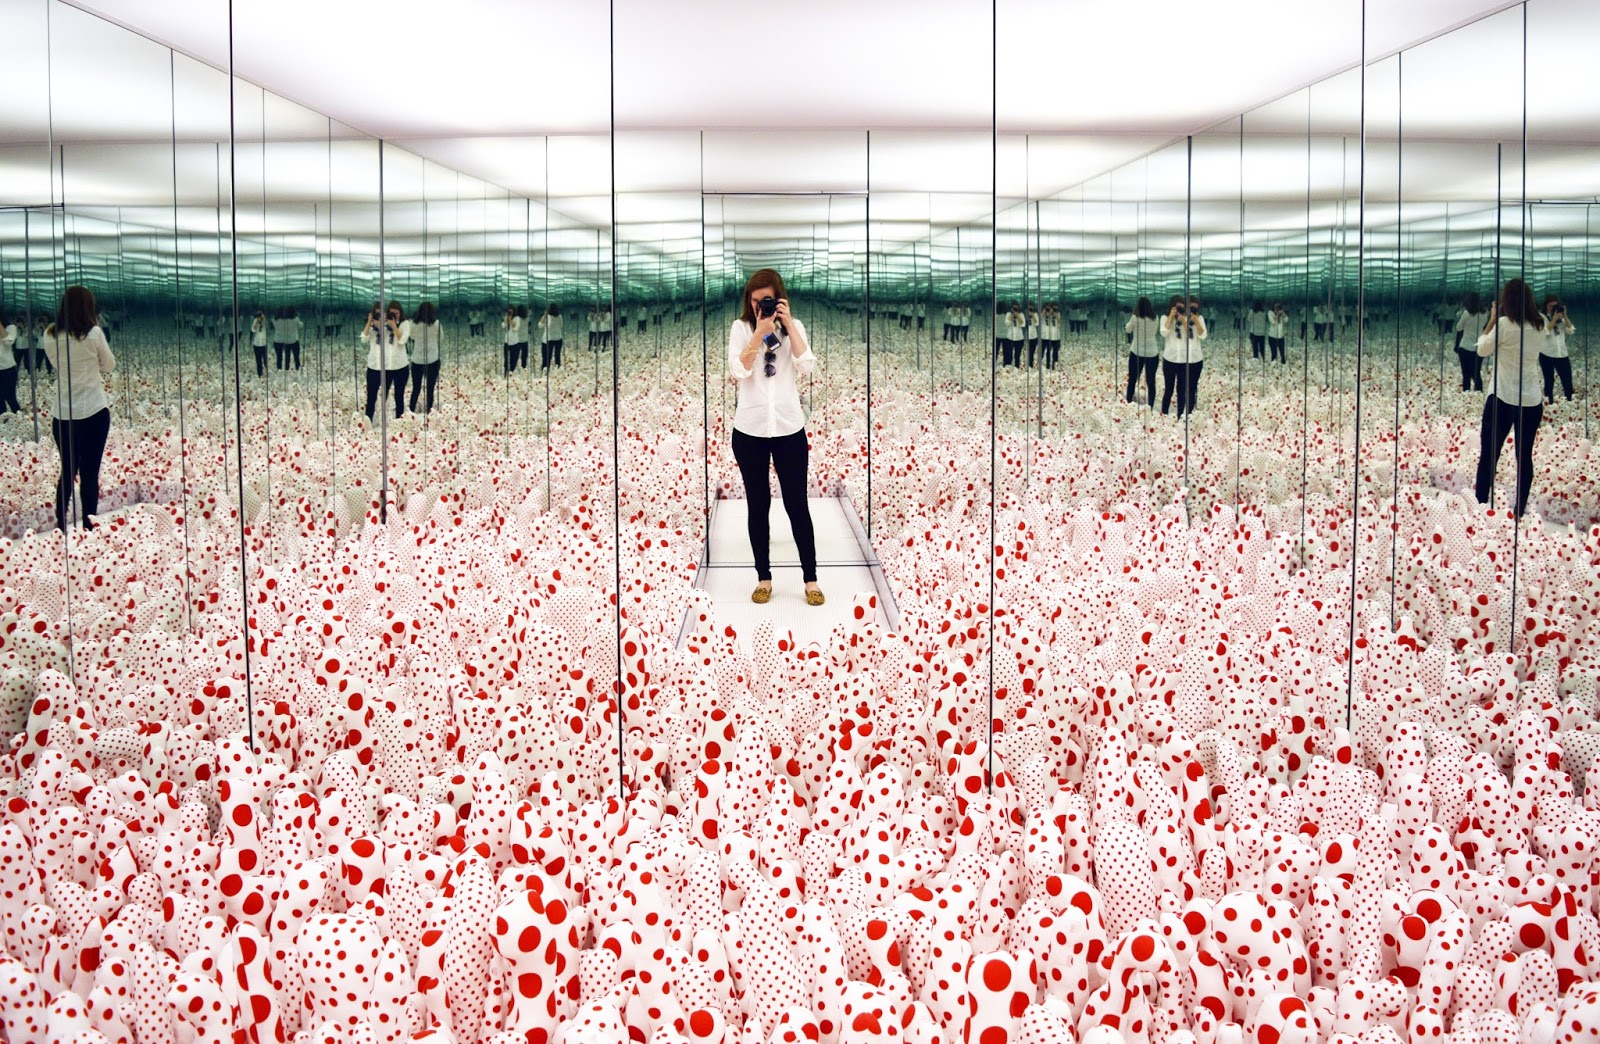 Yayio Kusama: Infinity Mirrors